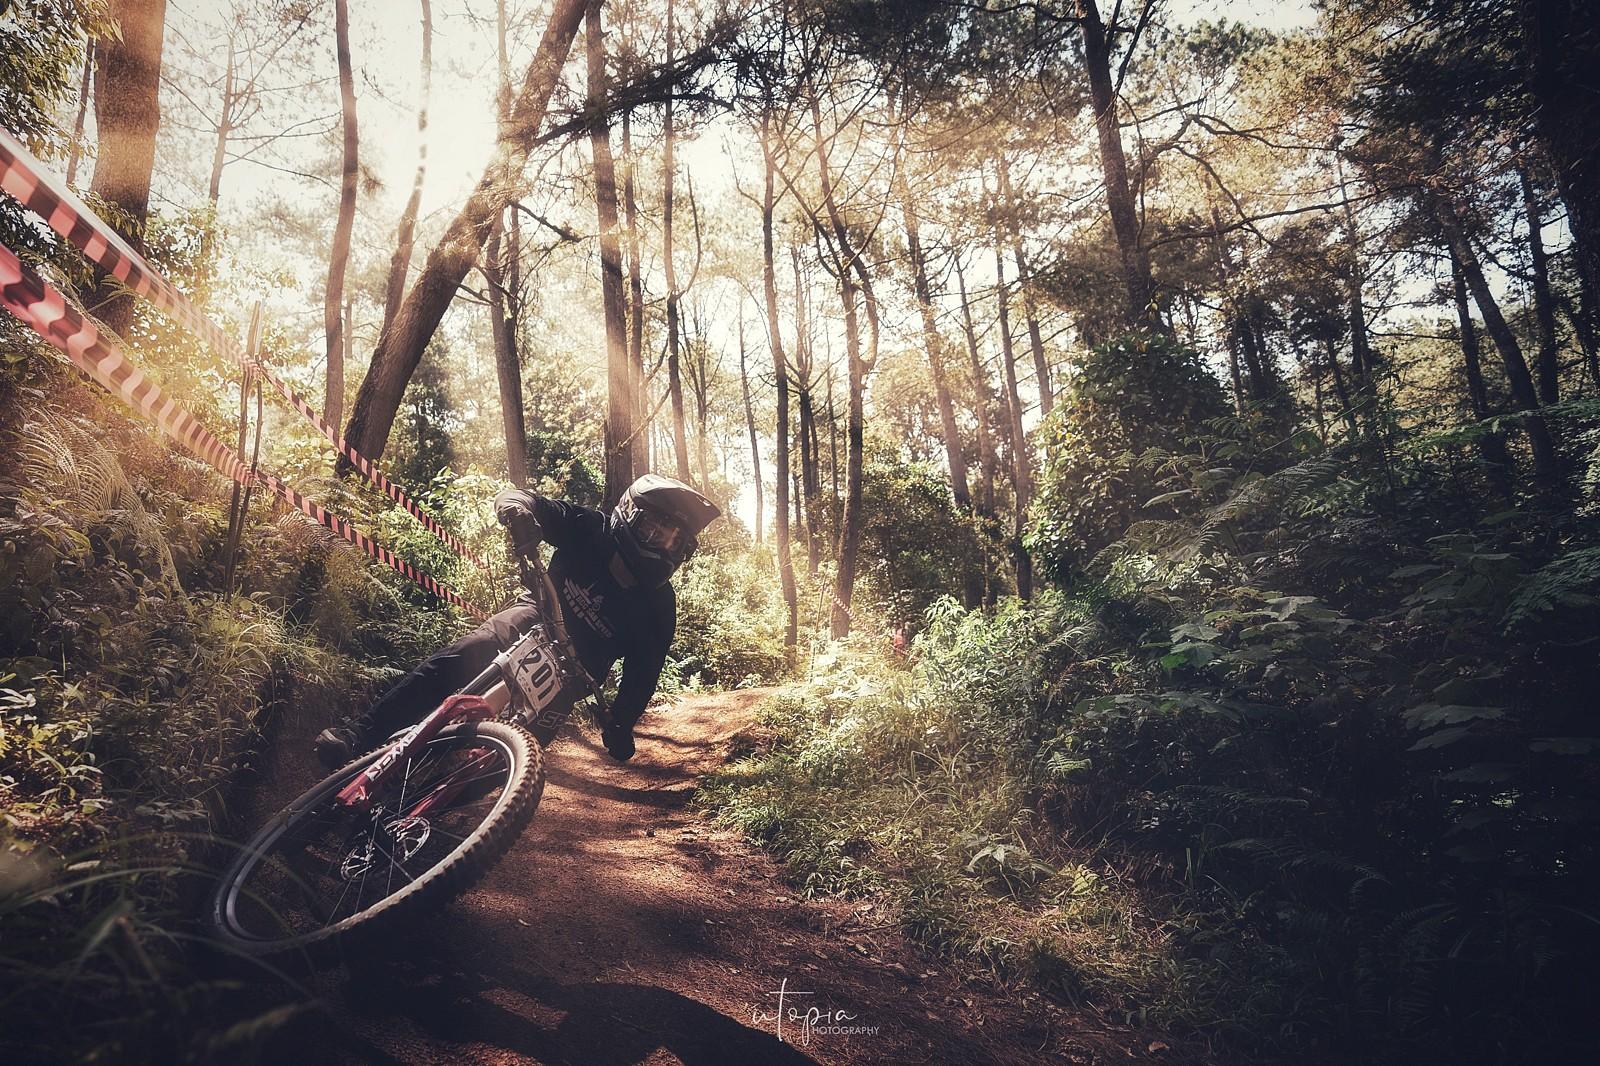 The Light  - utopiaarch - Mountain Biking Pictures - Vital MTB